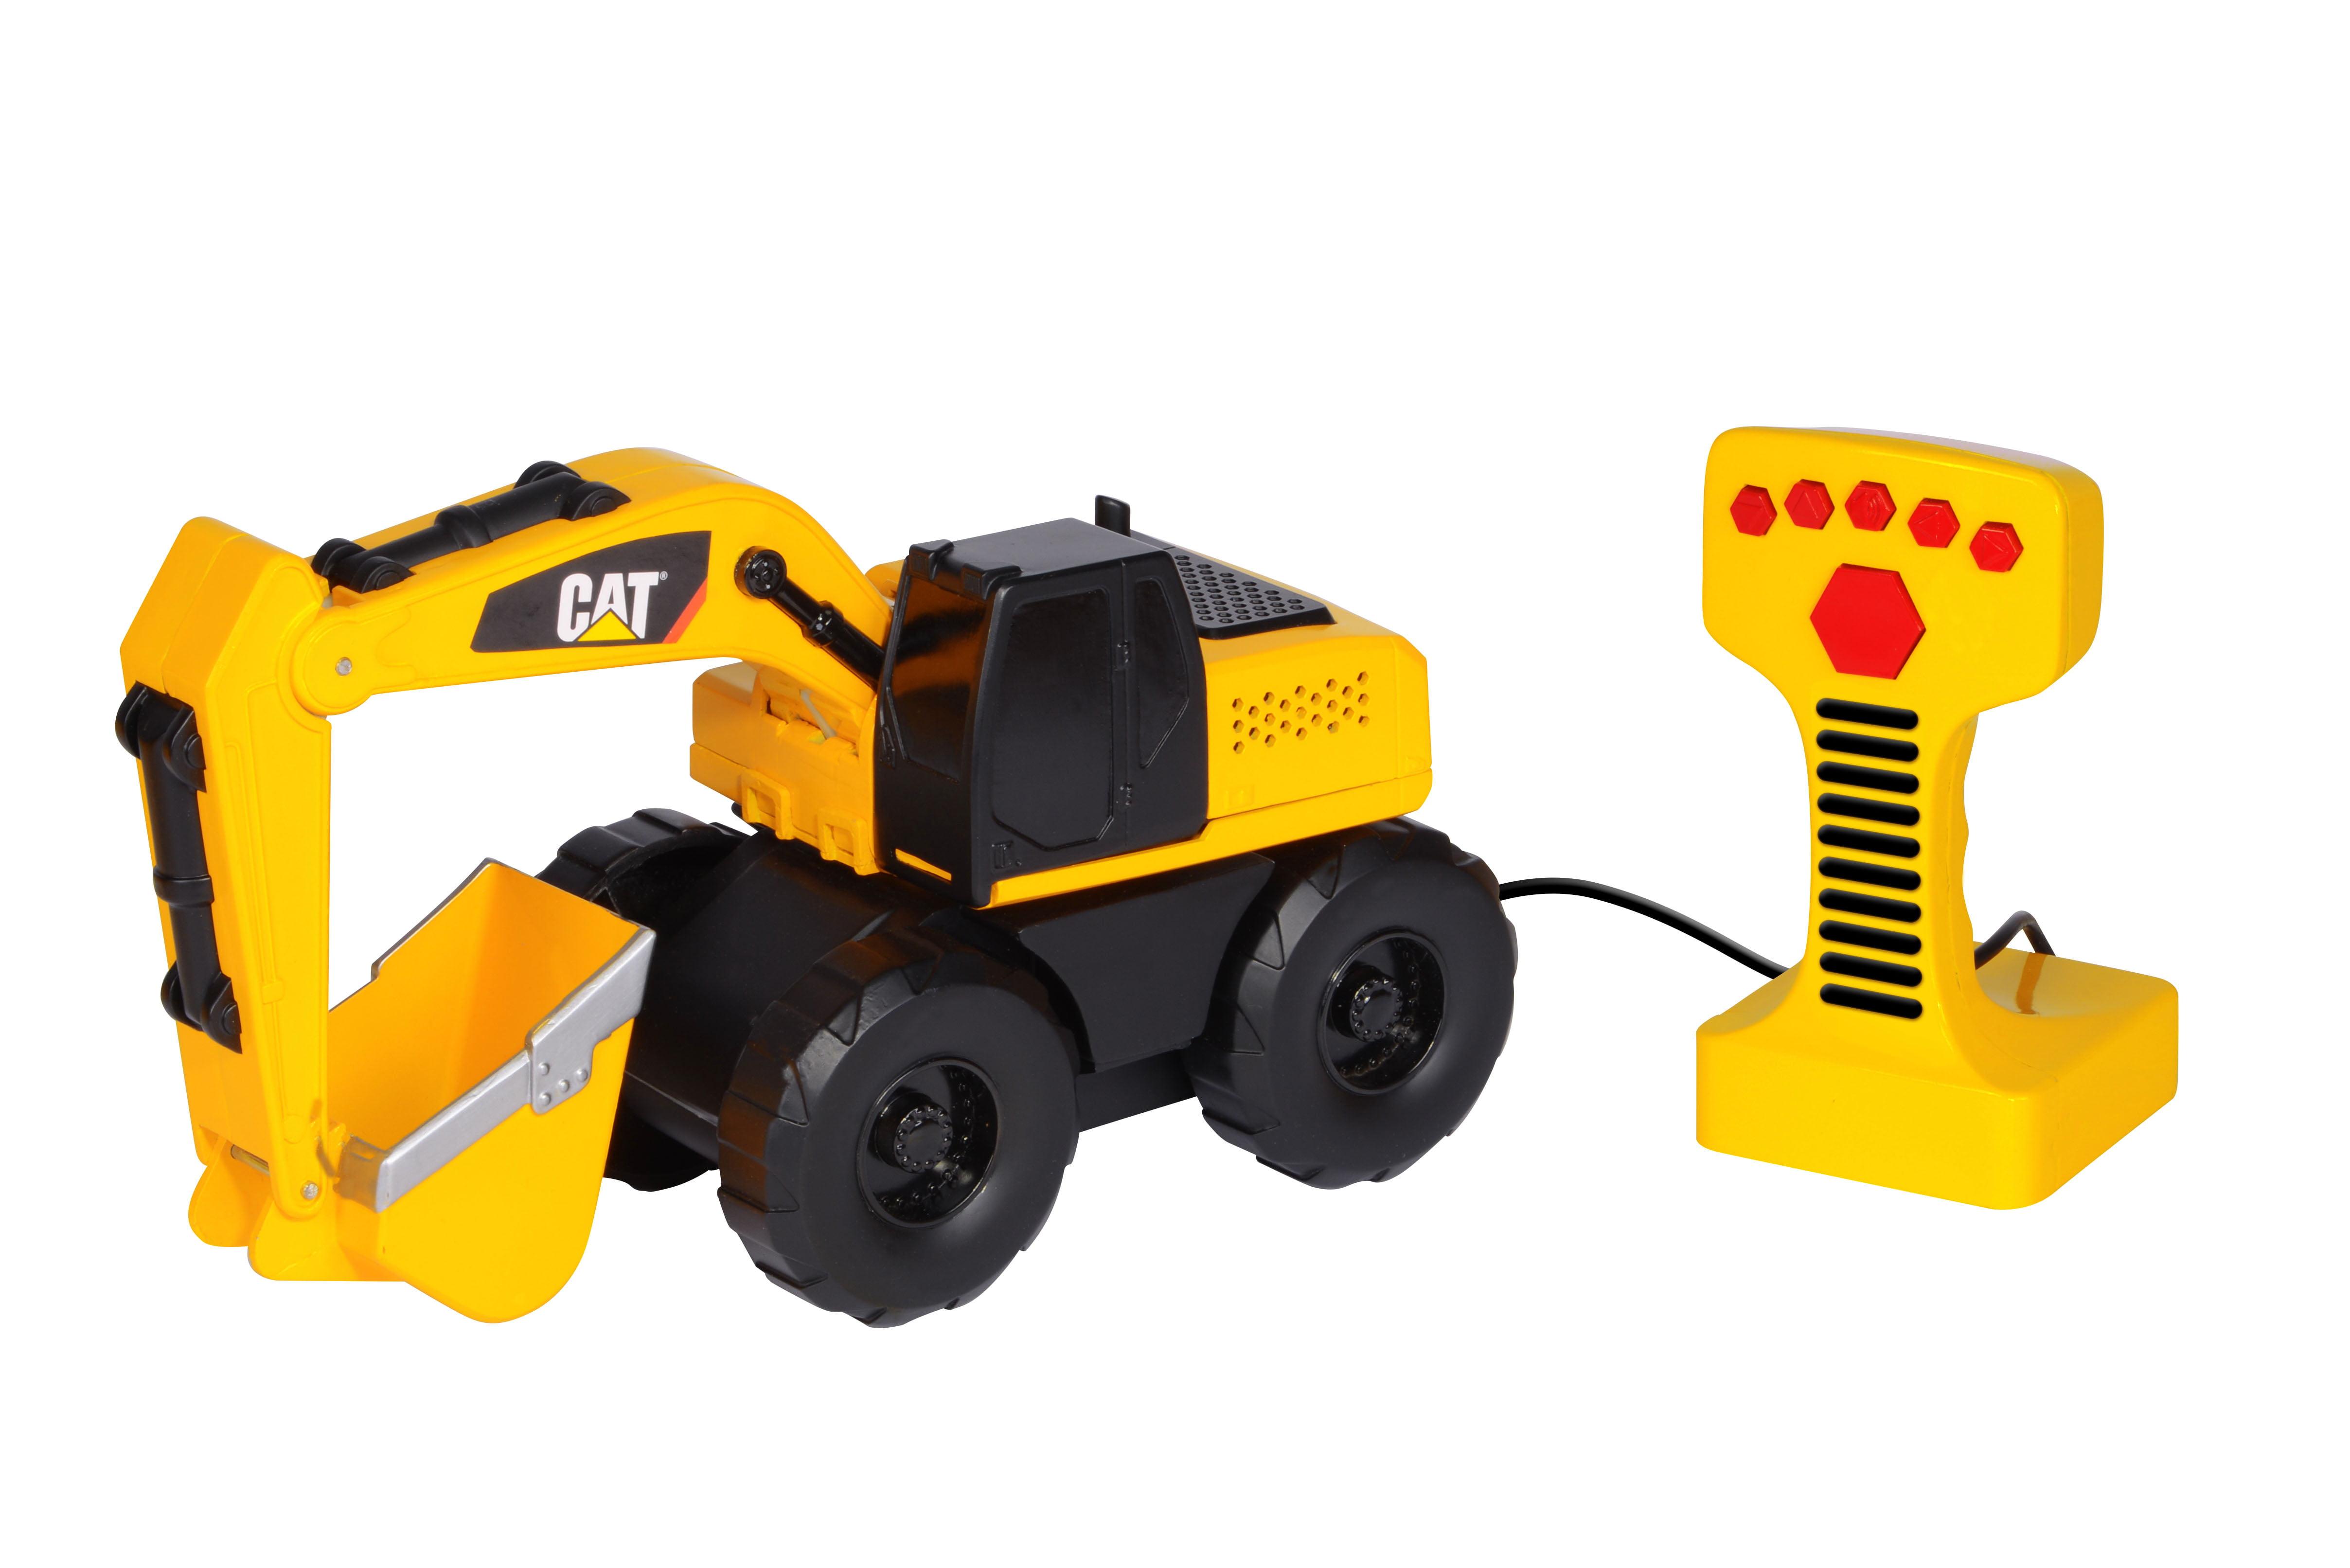 CAT Remote Control L&S Trucks Cement Truck by Generic